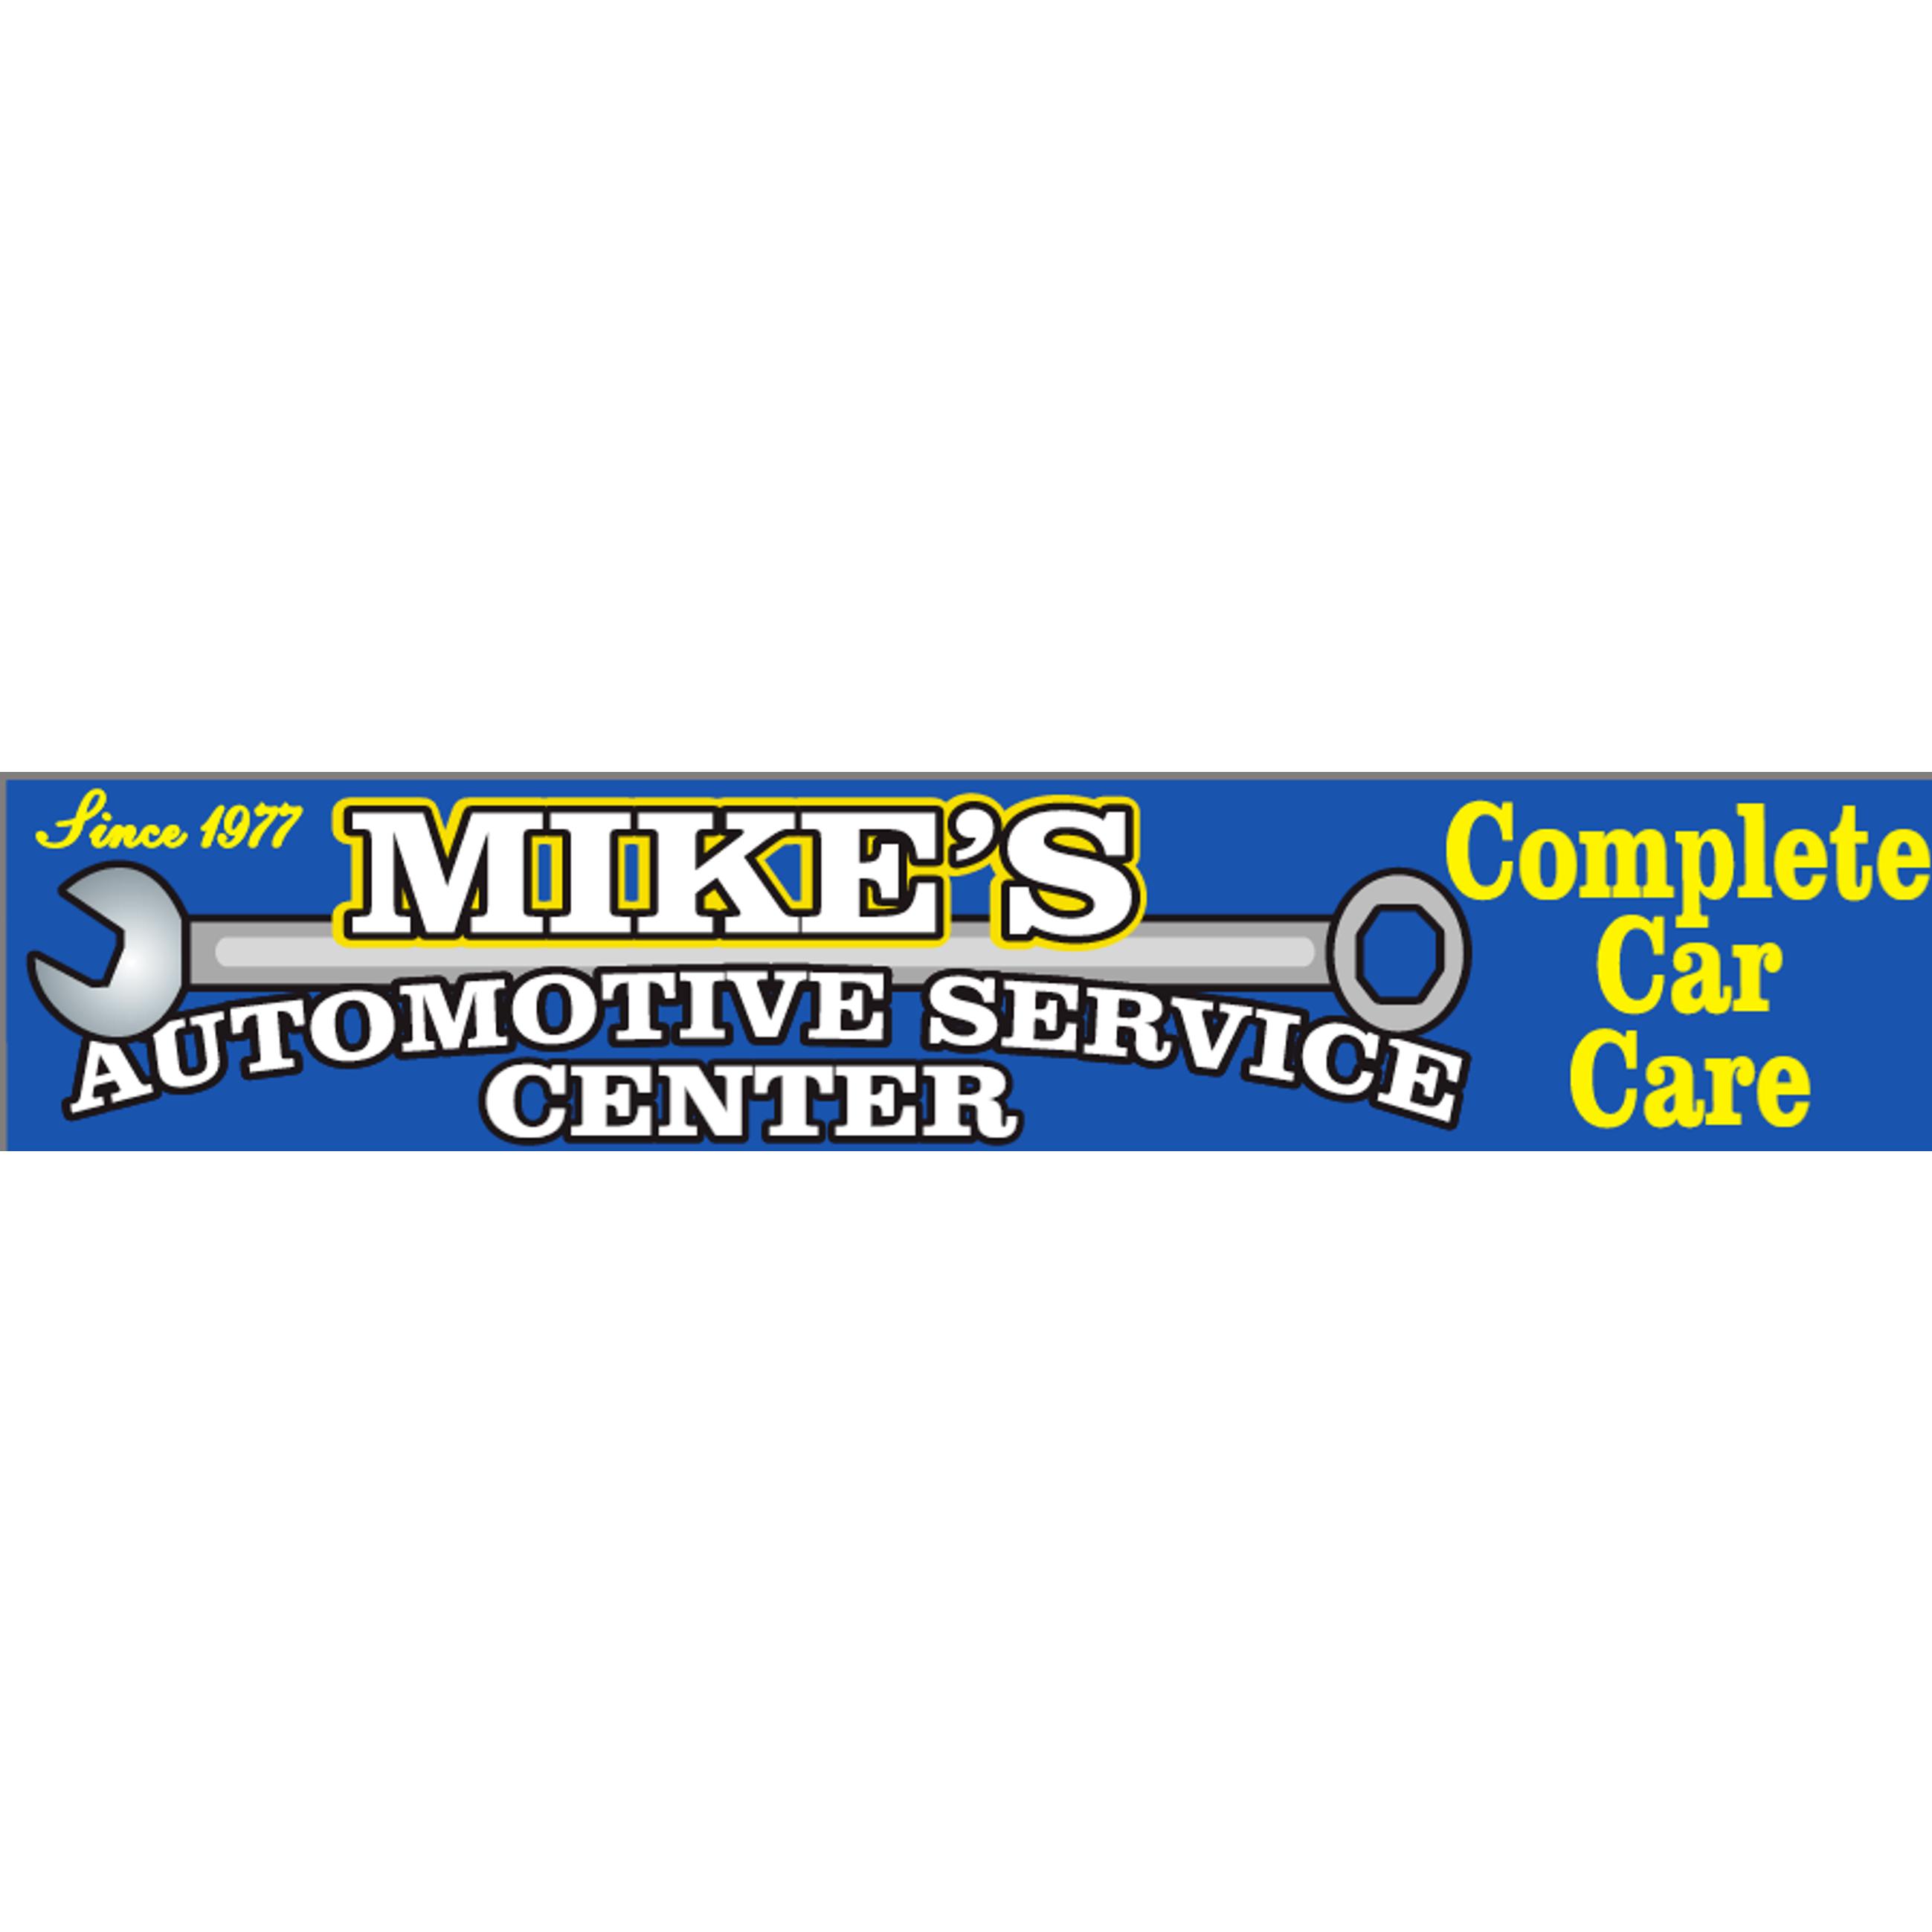 Mike's Automotive Service Center